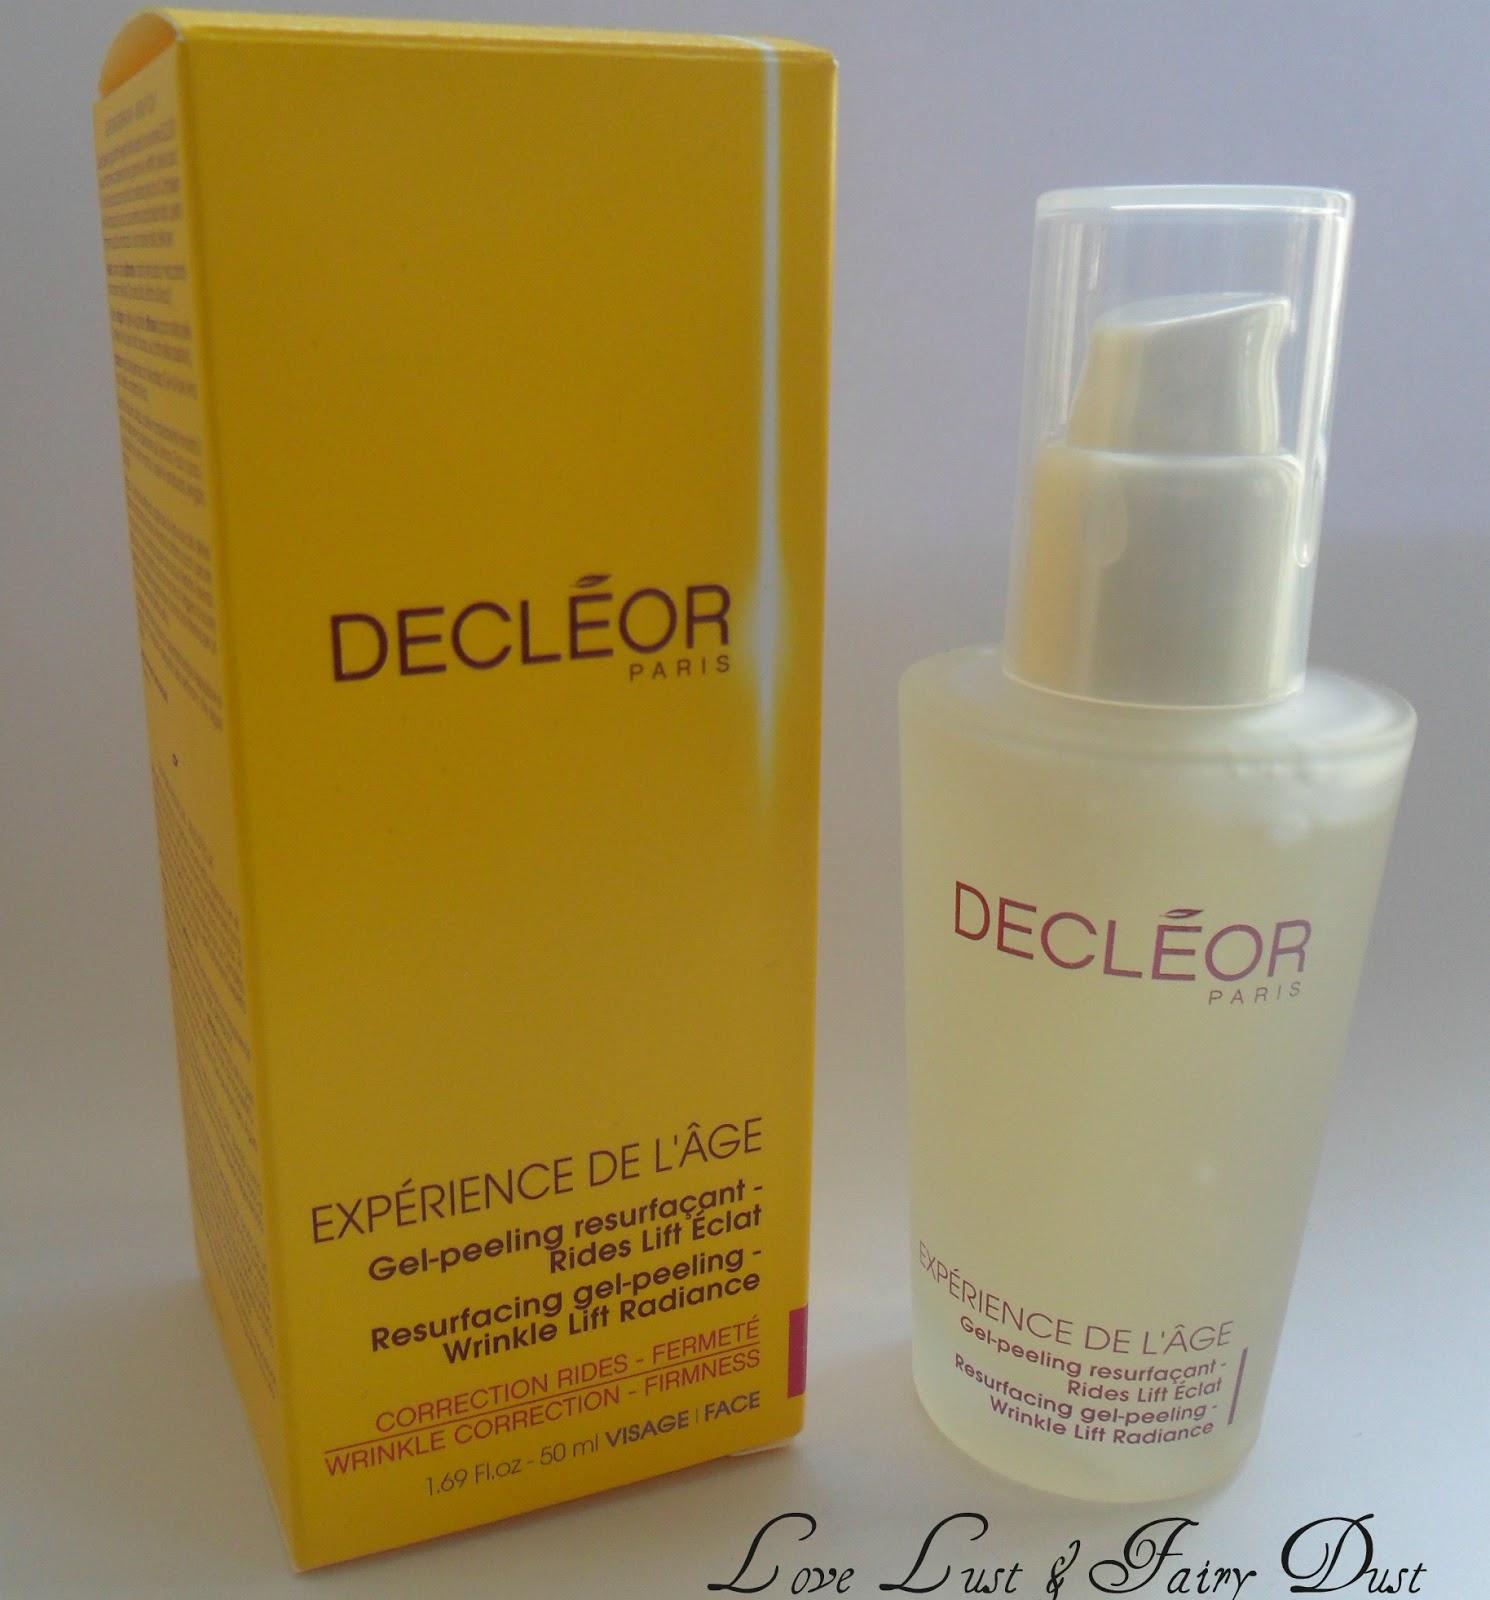 Decléor Experience De L'Age Resurfacing Gel-Peeling